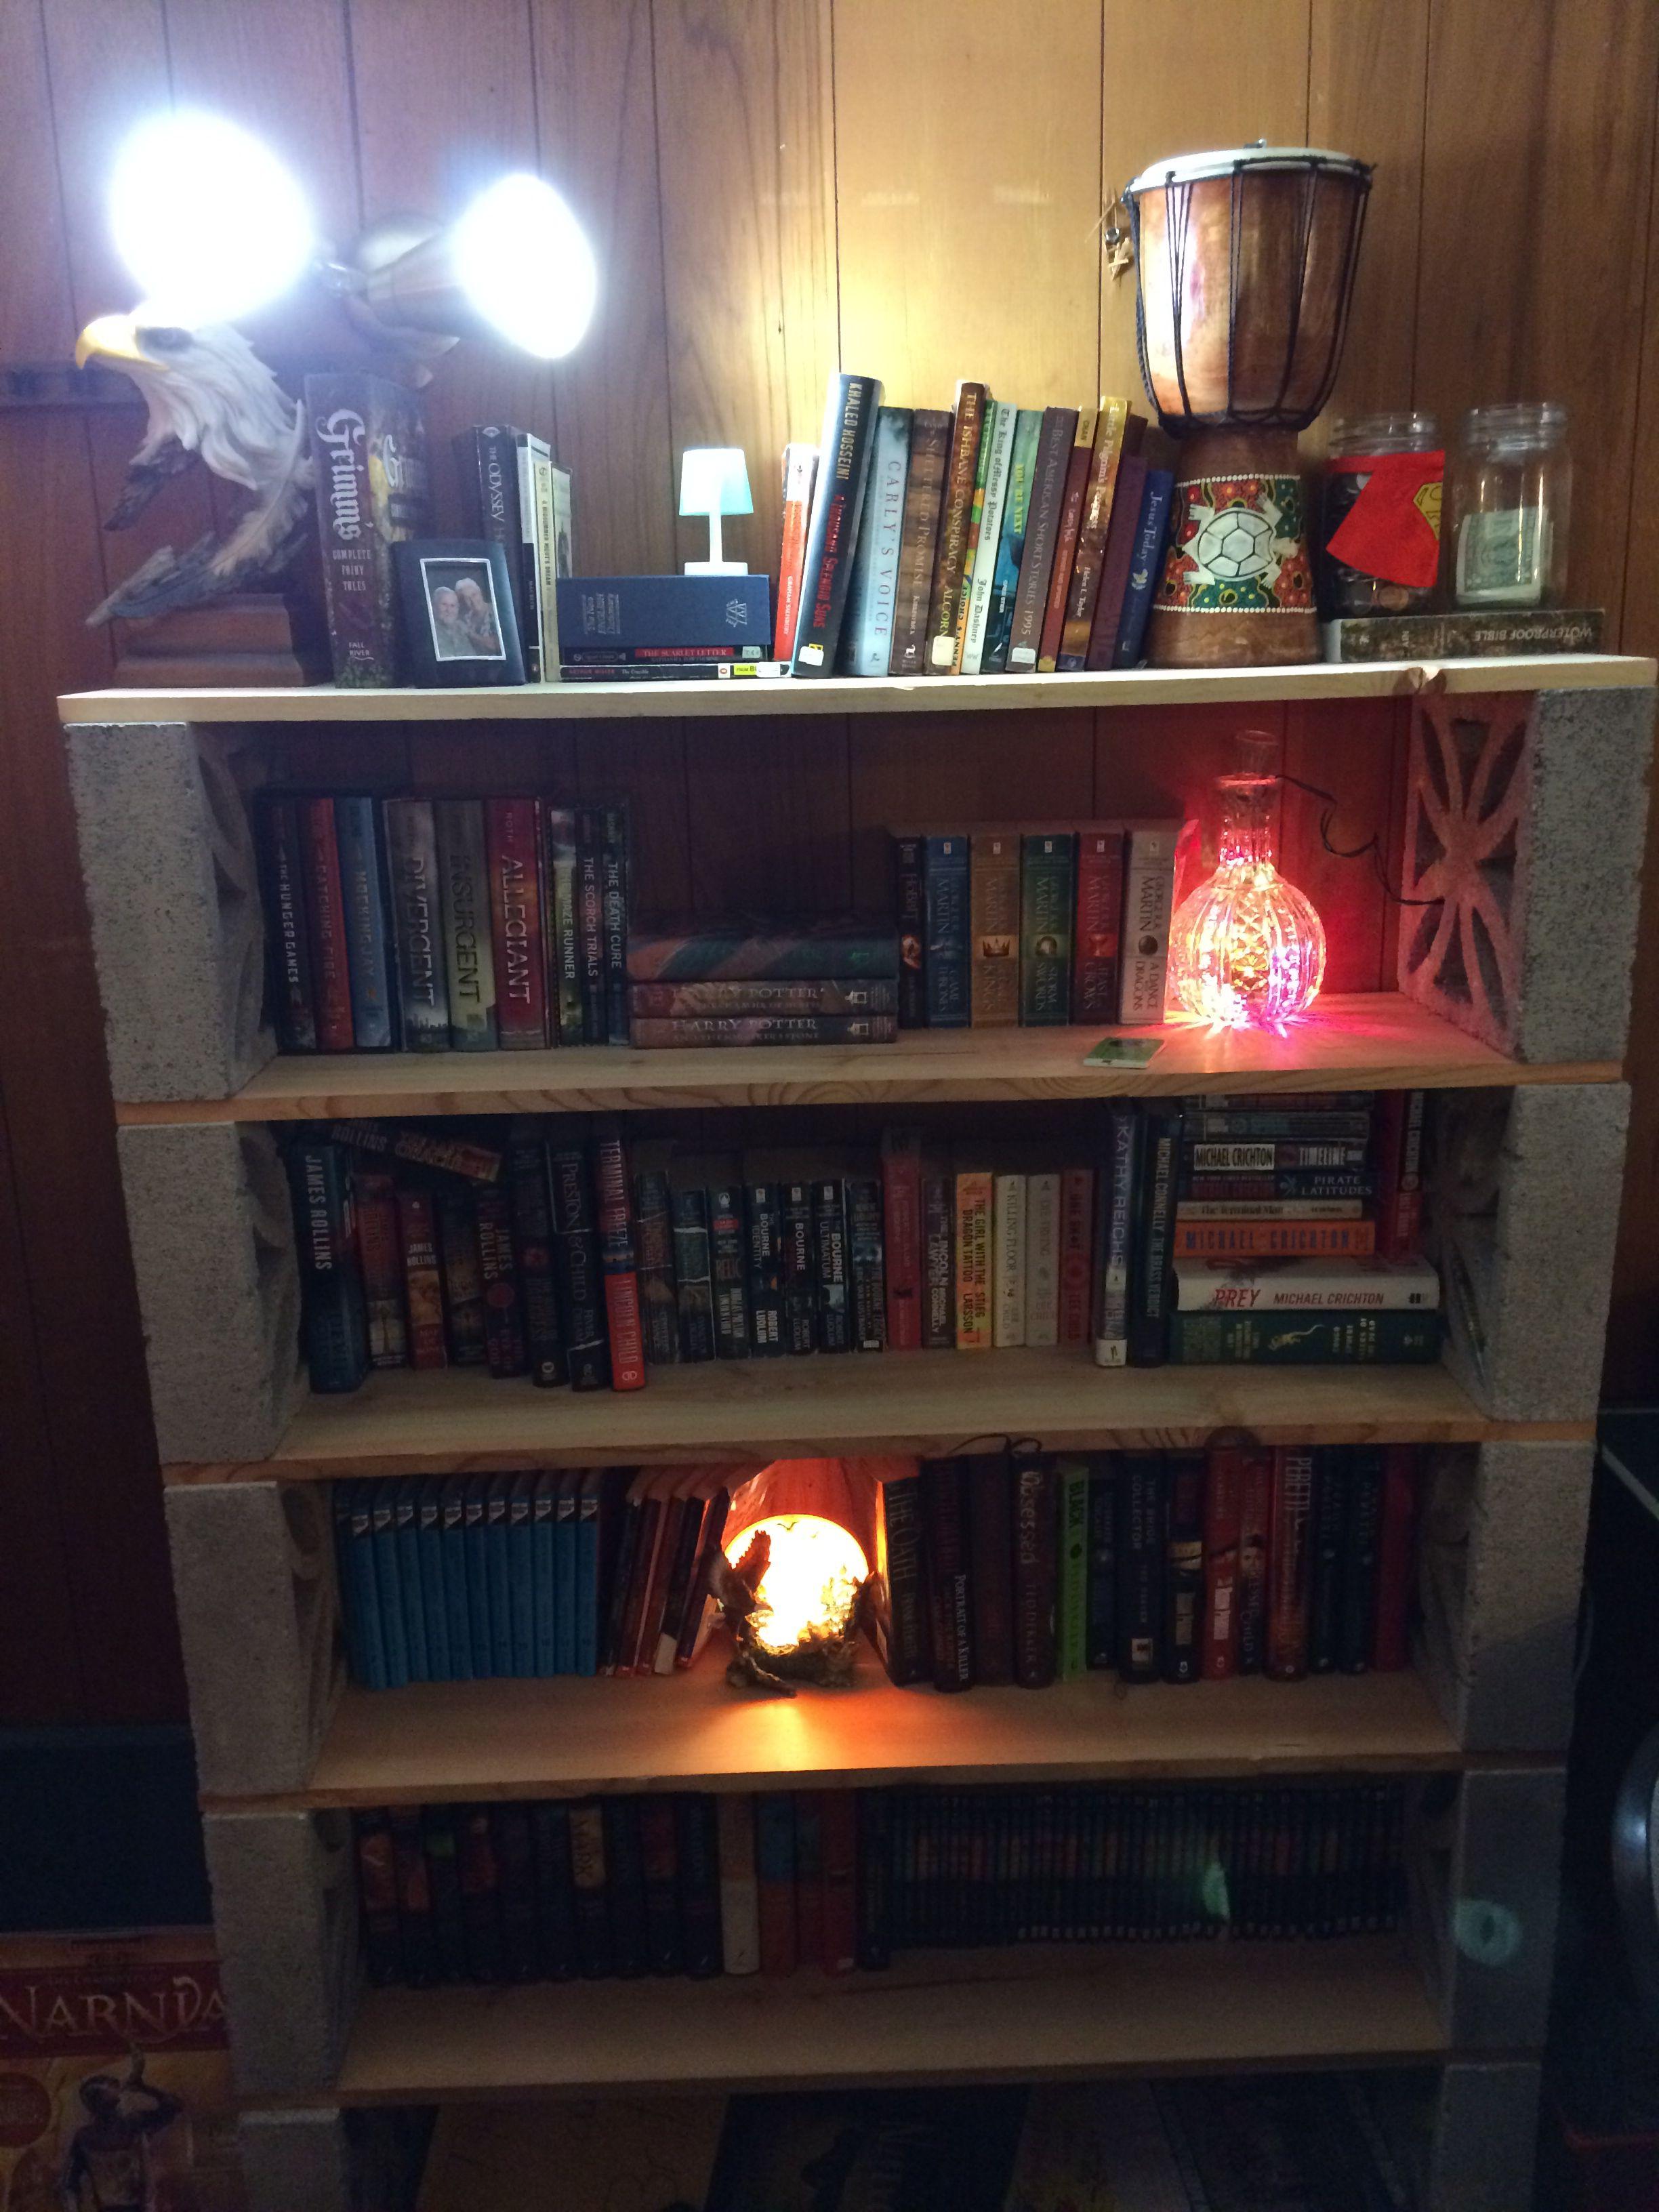 Home Made Bookshelf Using Cinder Blocks And Wood Planks Wood